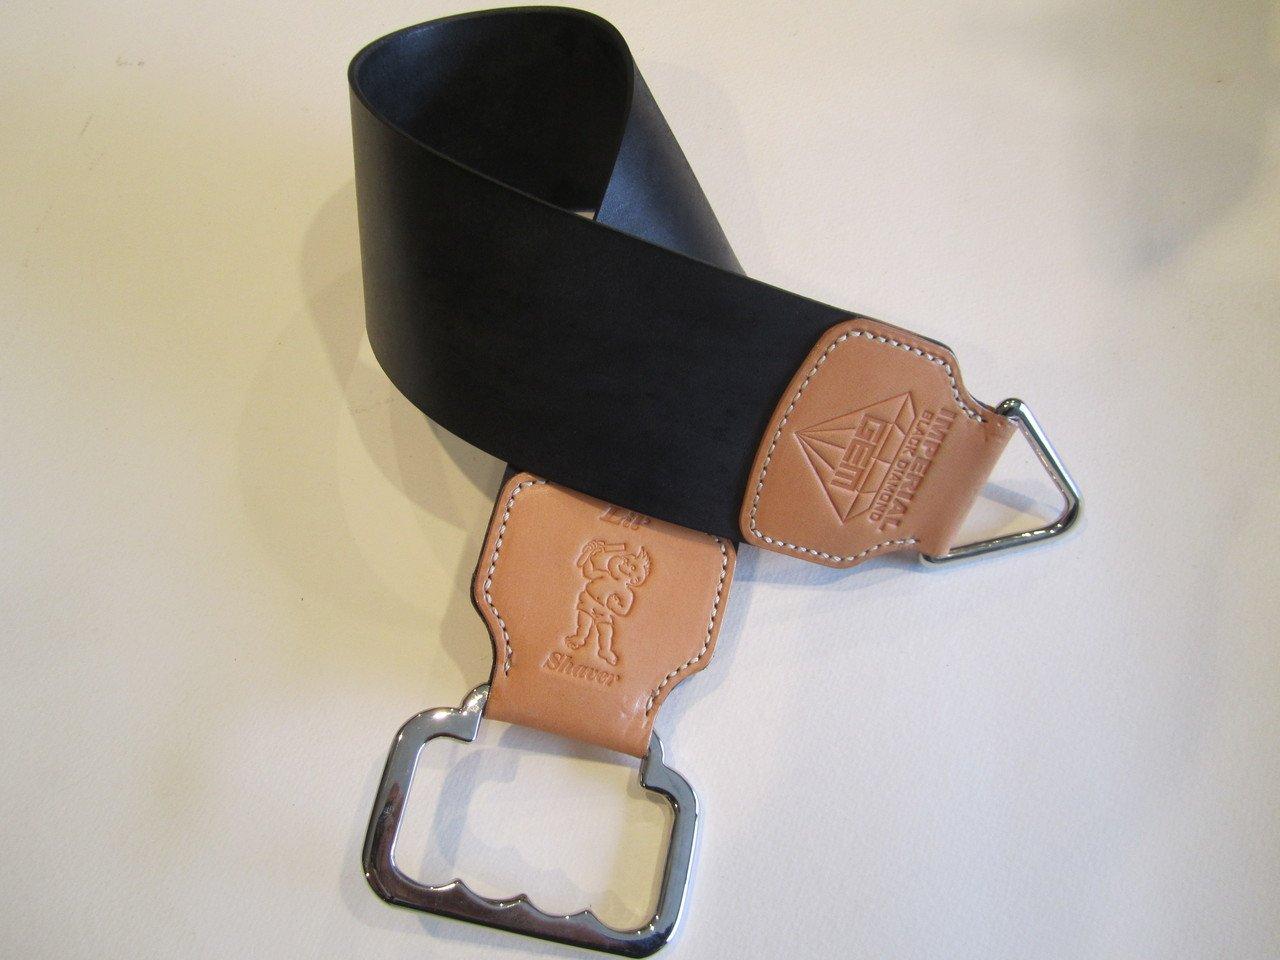 Lil' Shaver Gem/Black Diamond Horsehide Razor Strop